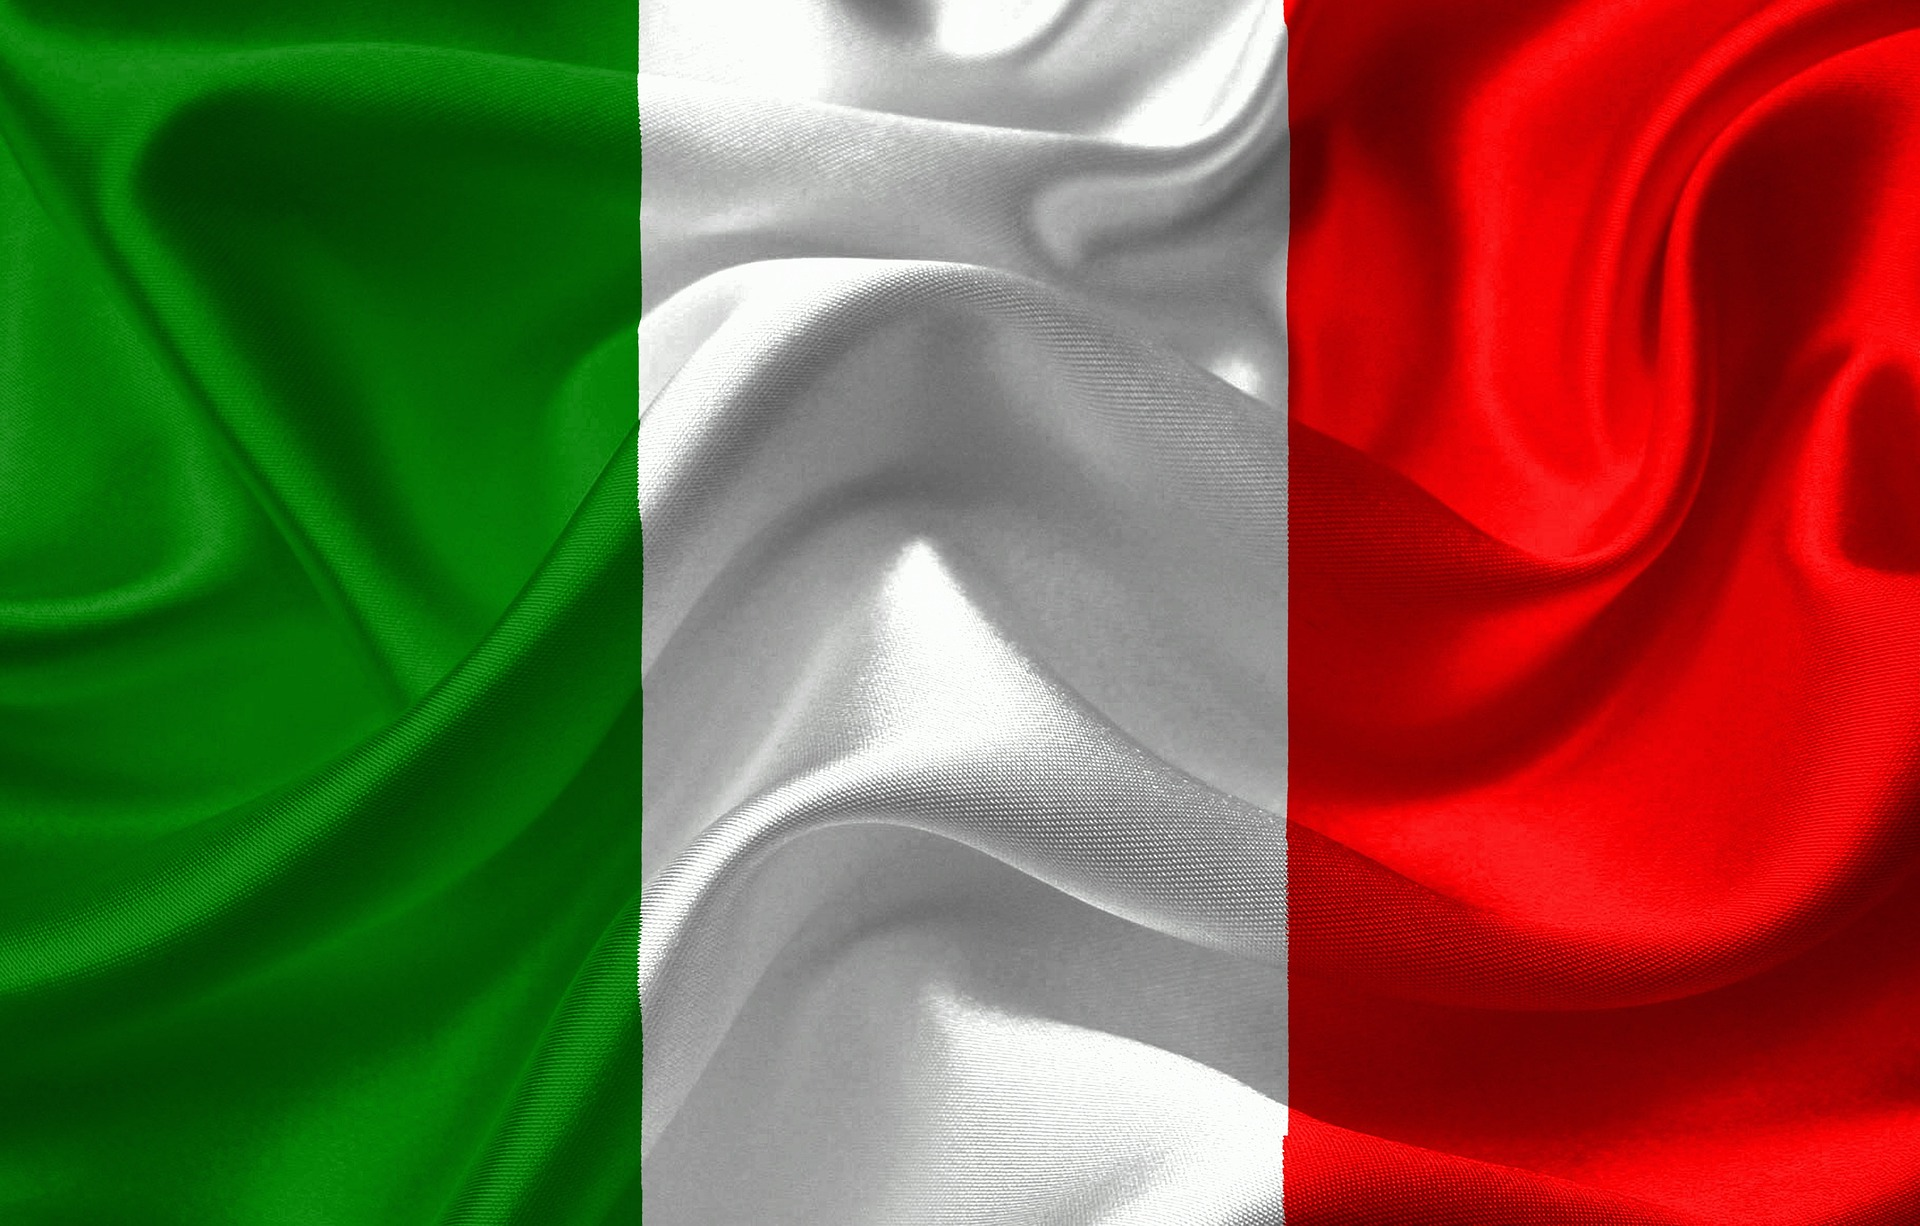 Coronavirus : Sibeth Ndiaye critique l'Italie, s'explique, mais ne s'excuse pas